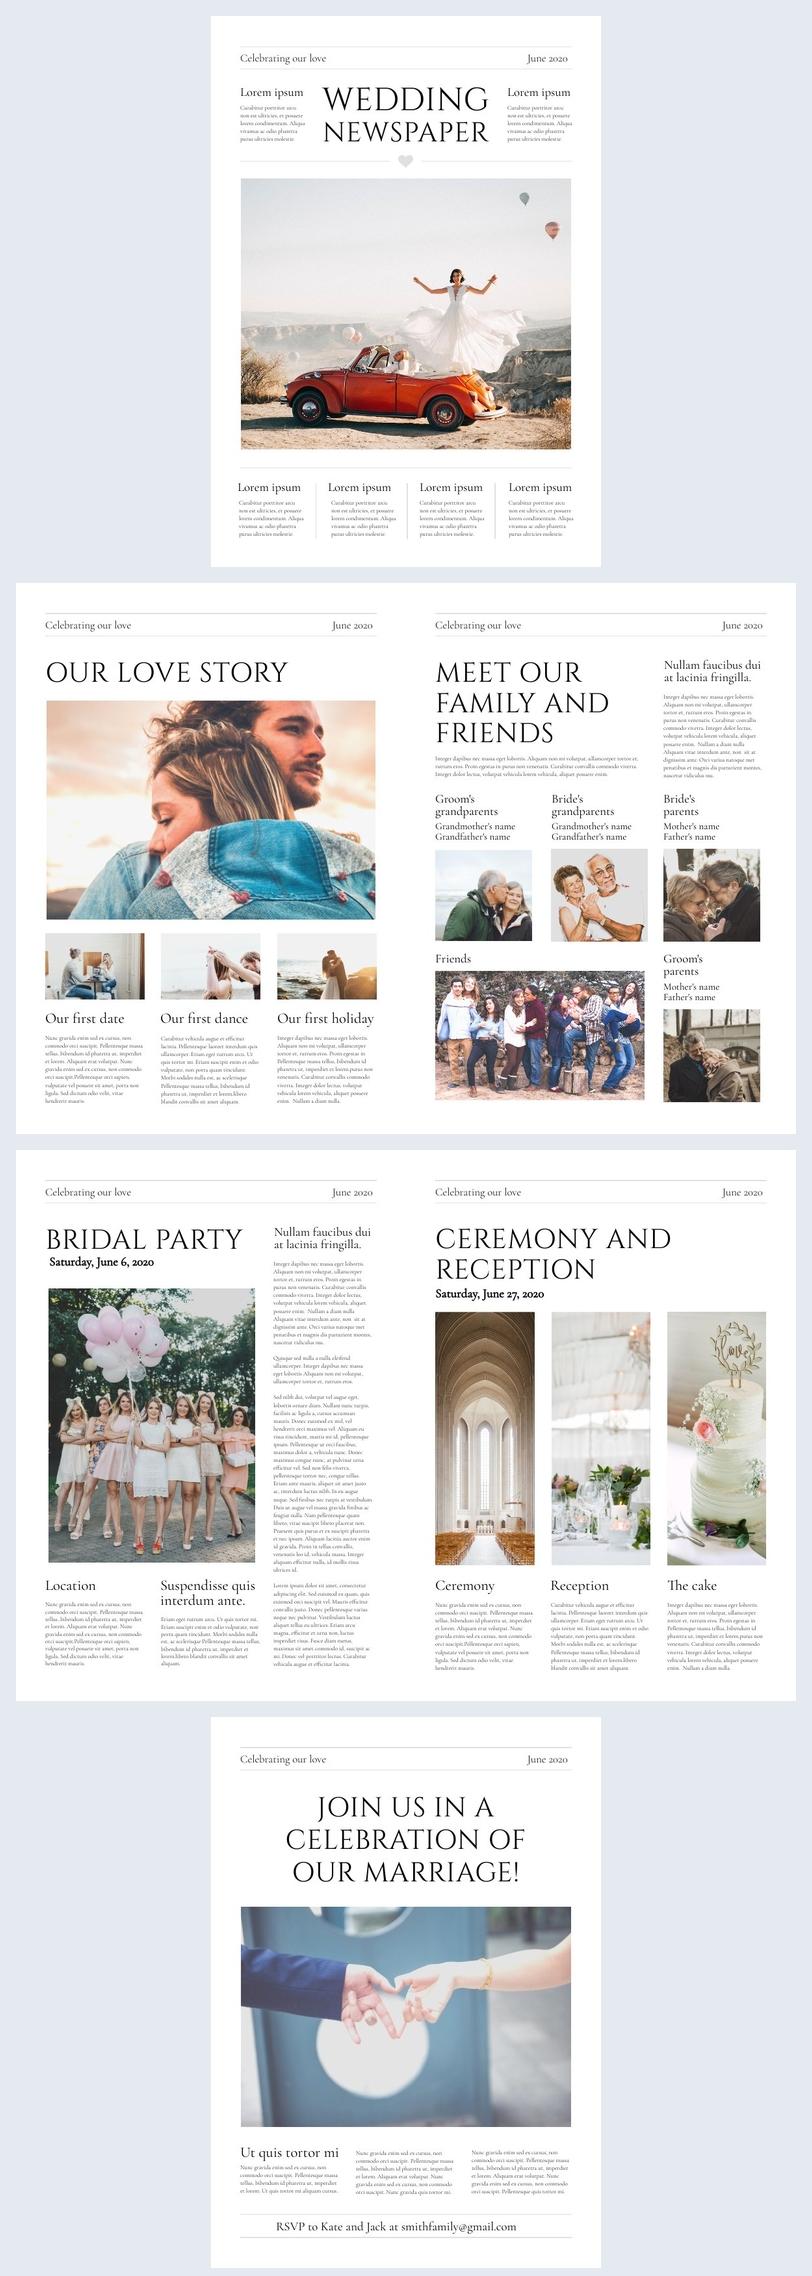 Exemple de design de journal de mariage